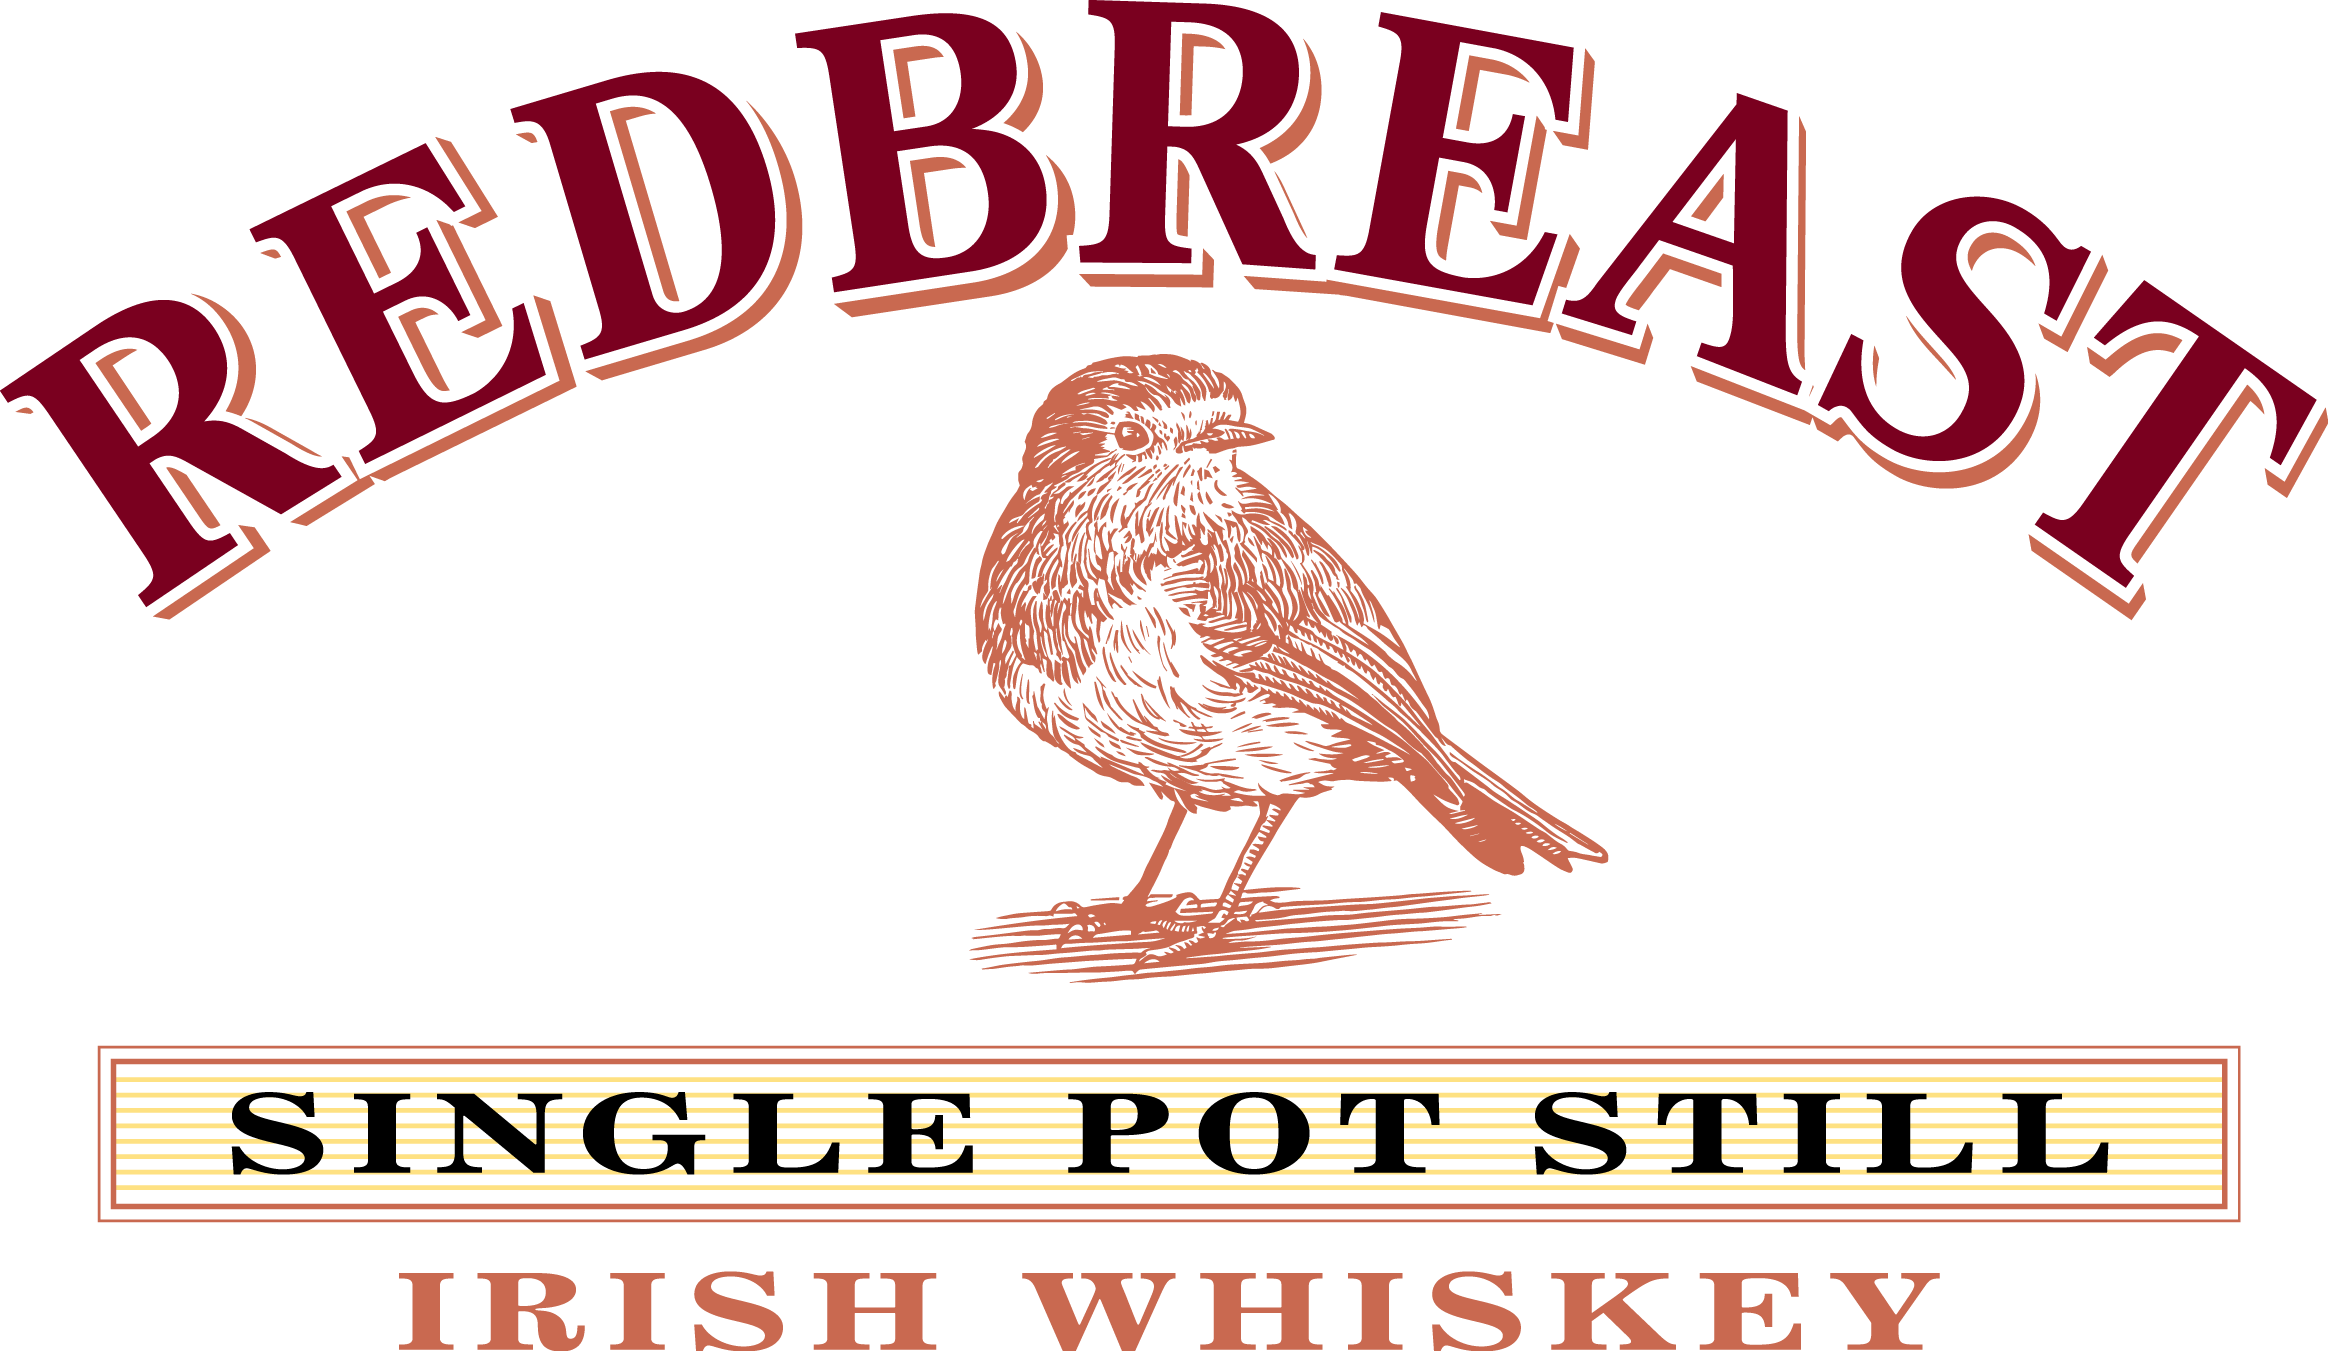 Redbreast_logo1